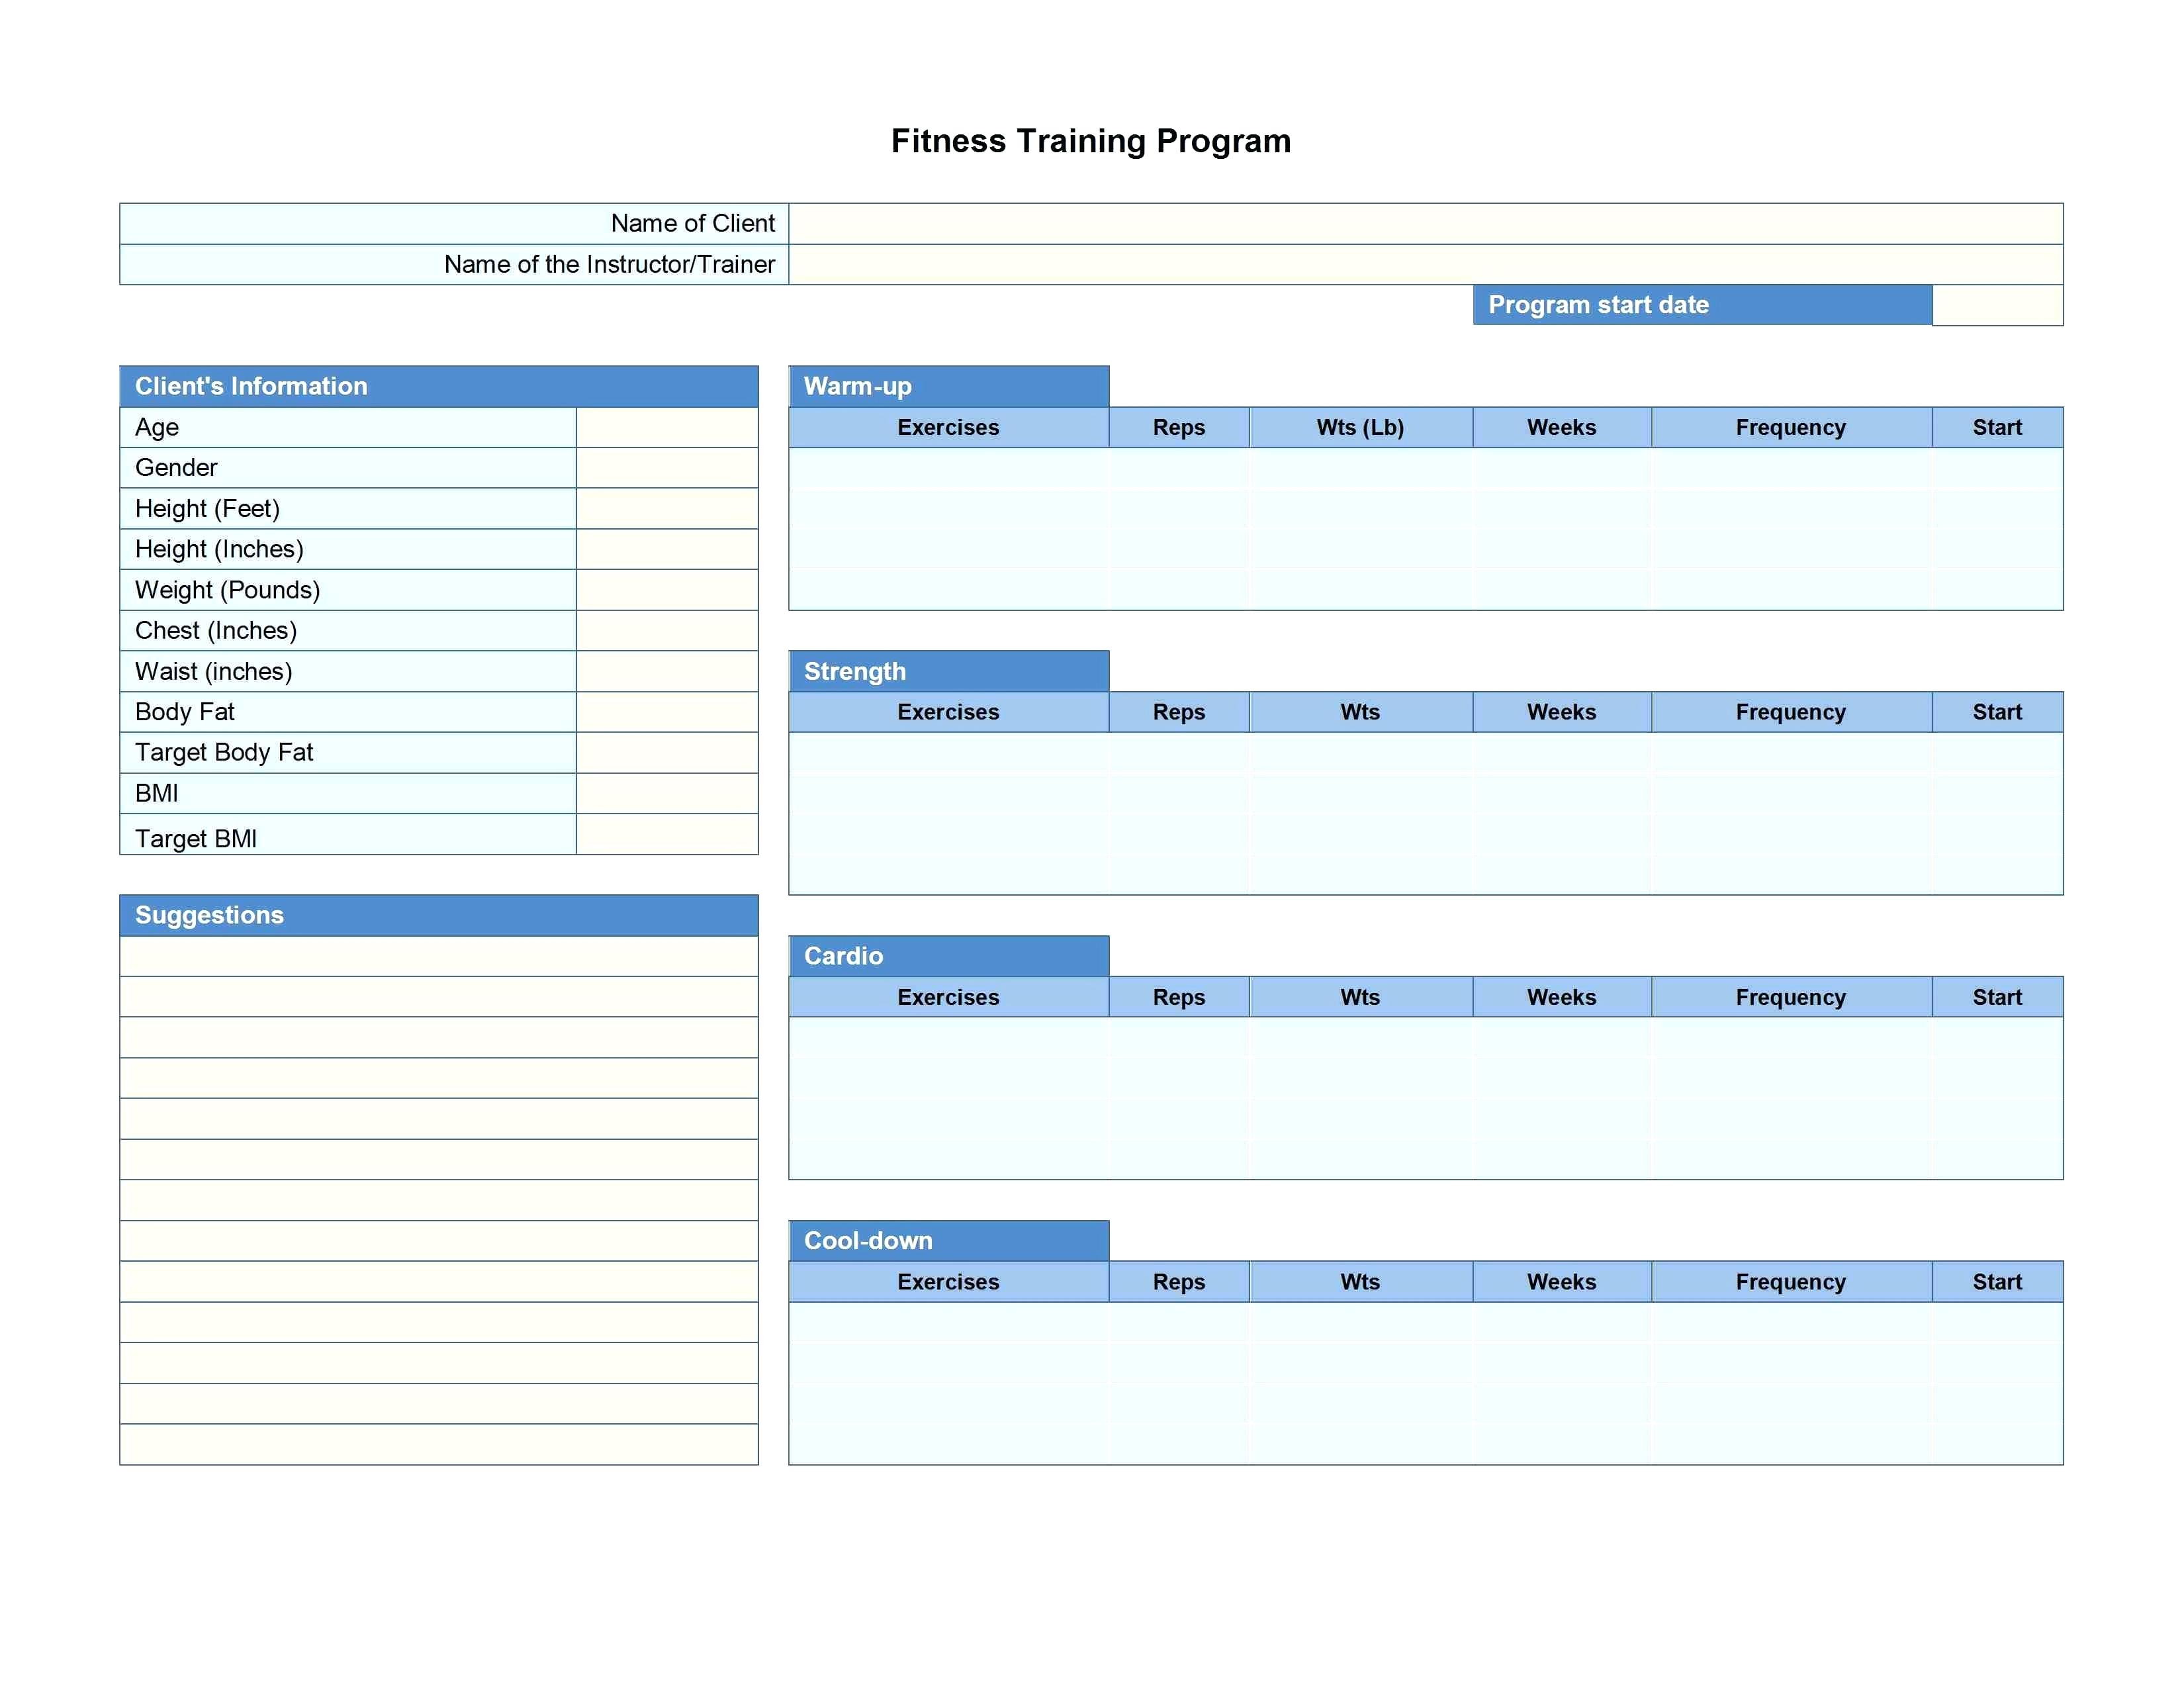 Workout Template Spreadsheet Regarding Template: Weights Program Template Weightlifting Excel Spreadsheet